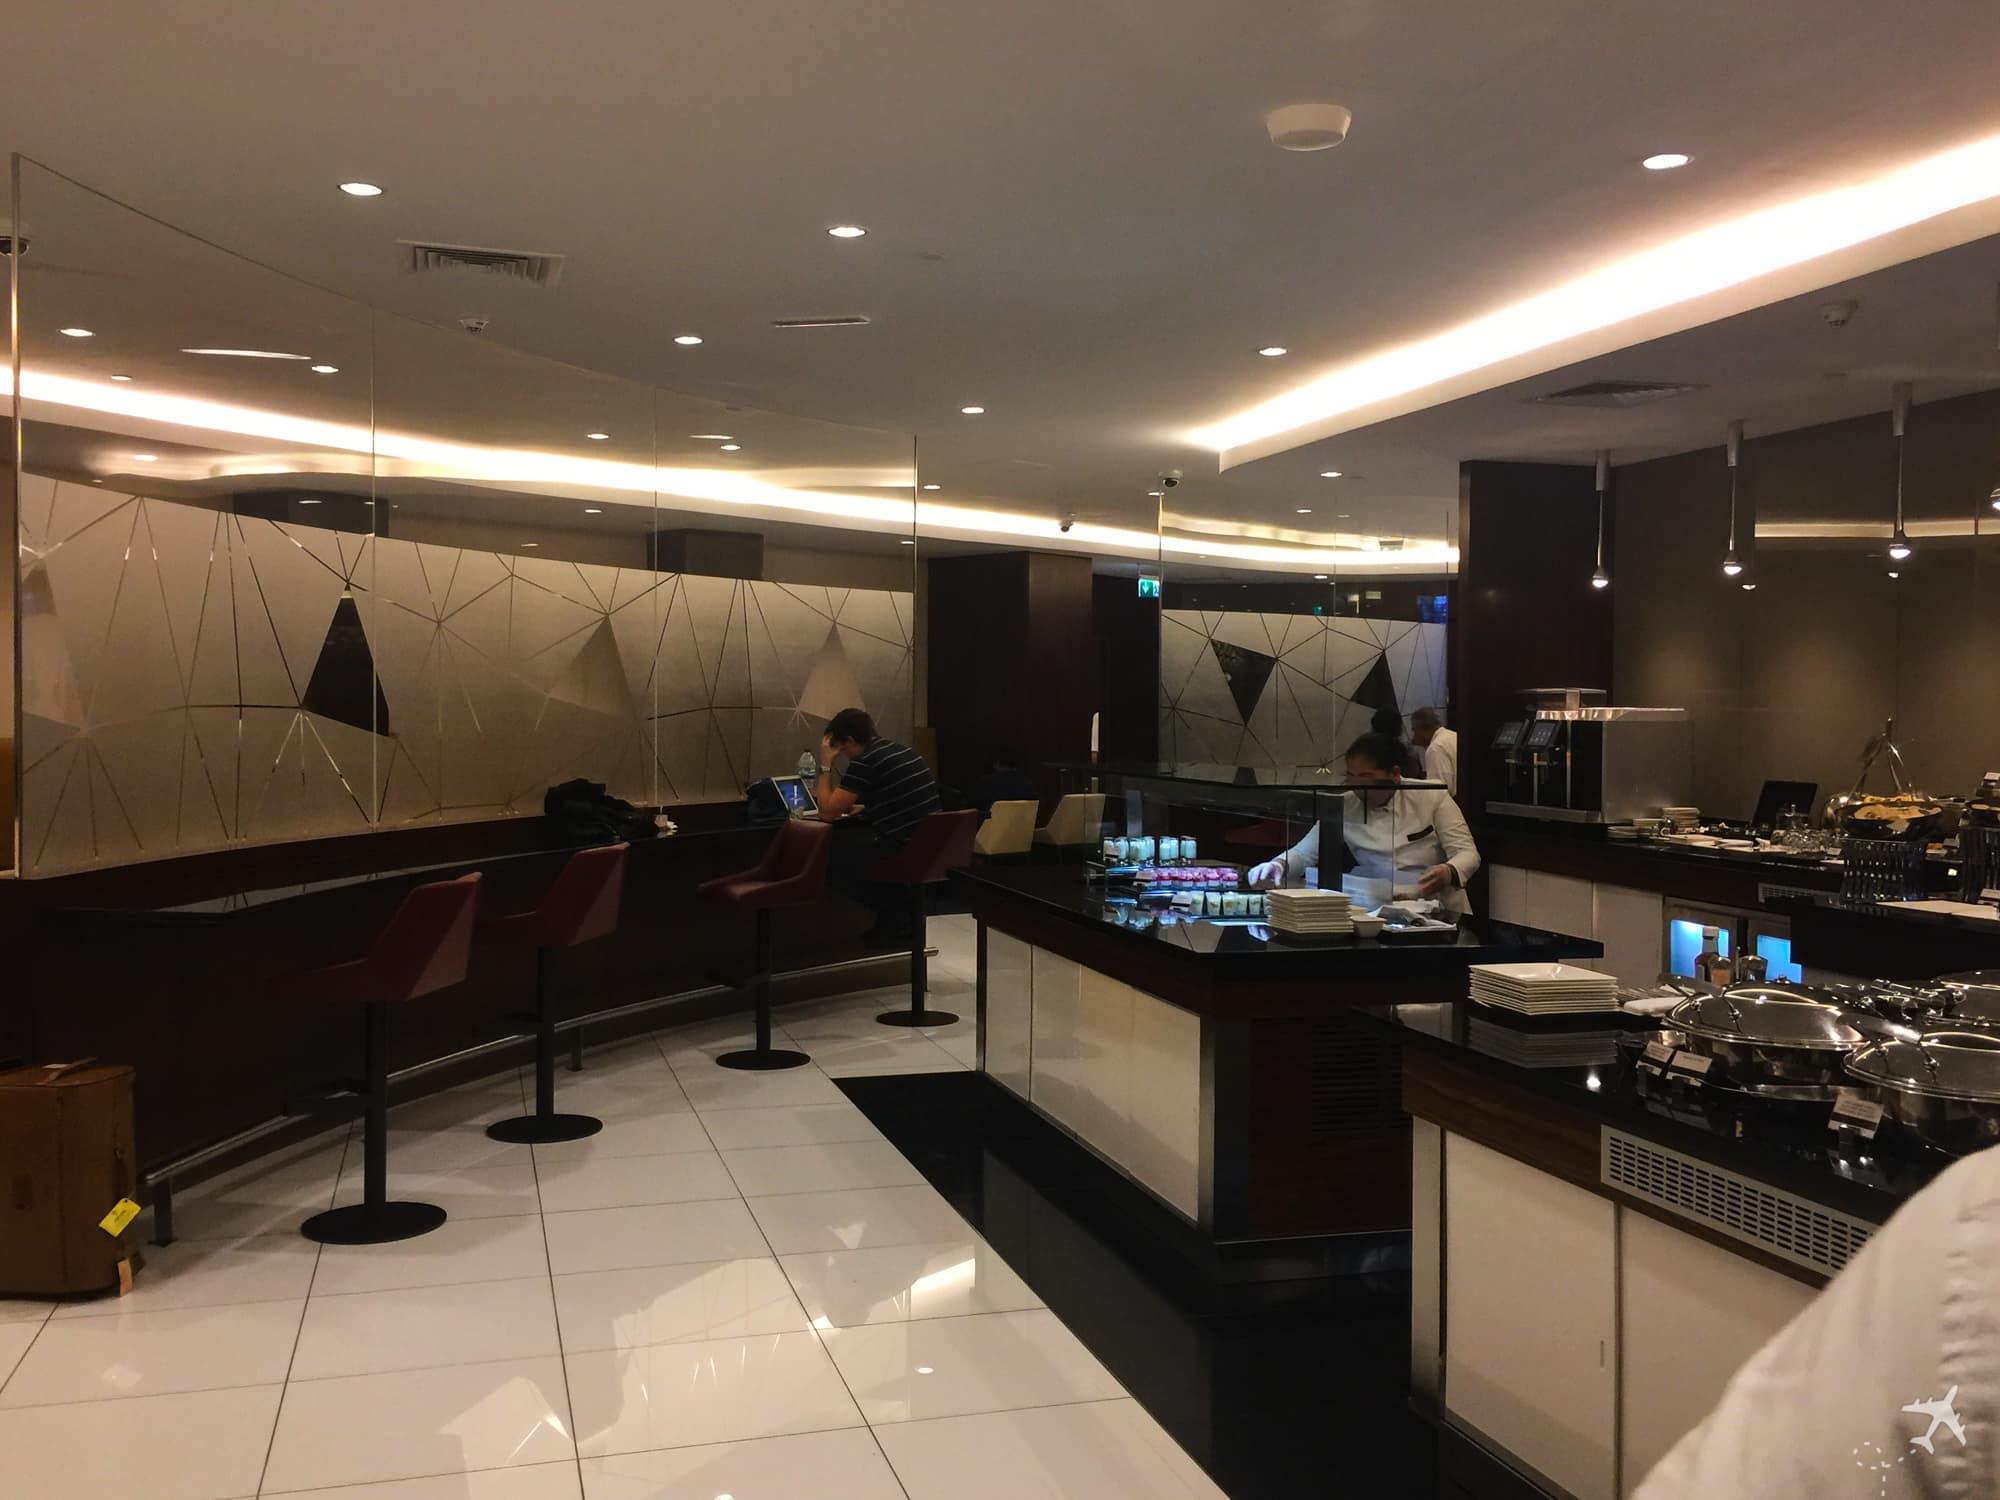 Etihad Airways Lounge Abu Dhabi Buffet